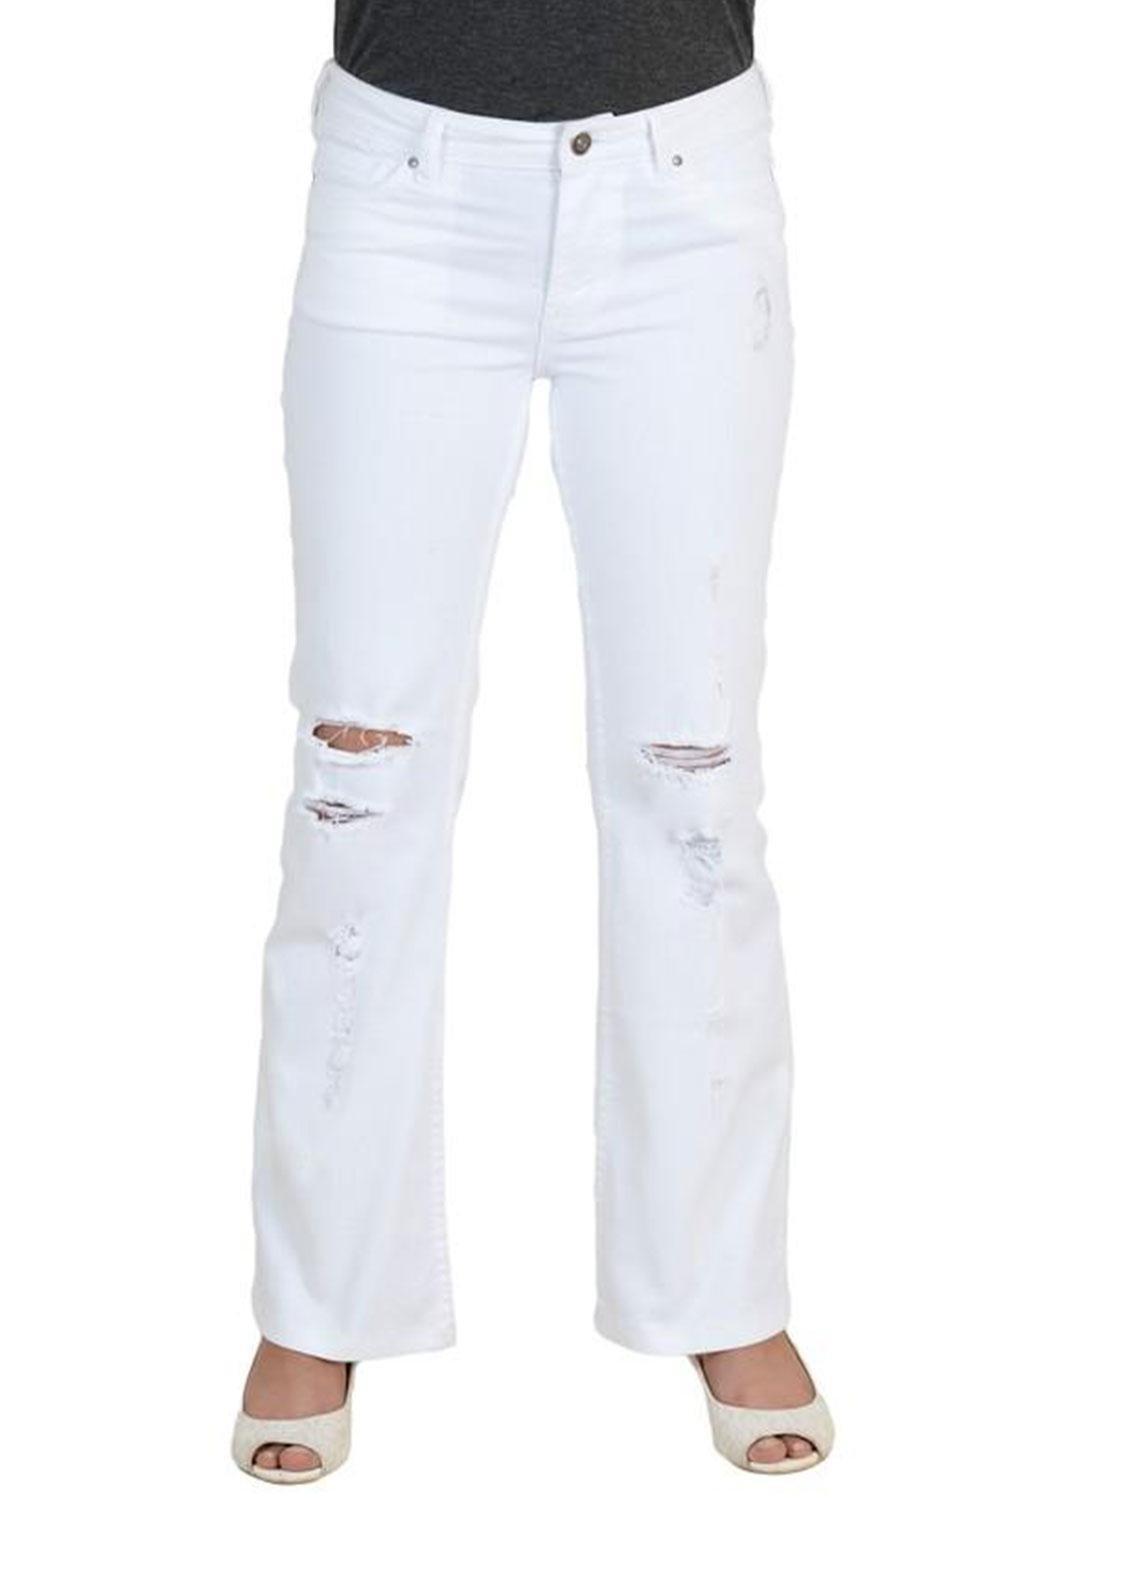 Ignite Wardrobe Stretchable Cotton Boot Cut Pants IG20PNW 006